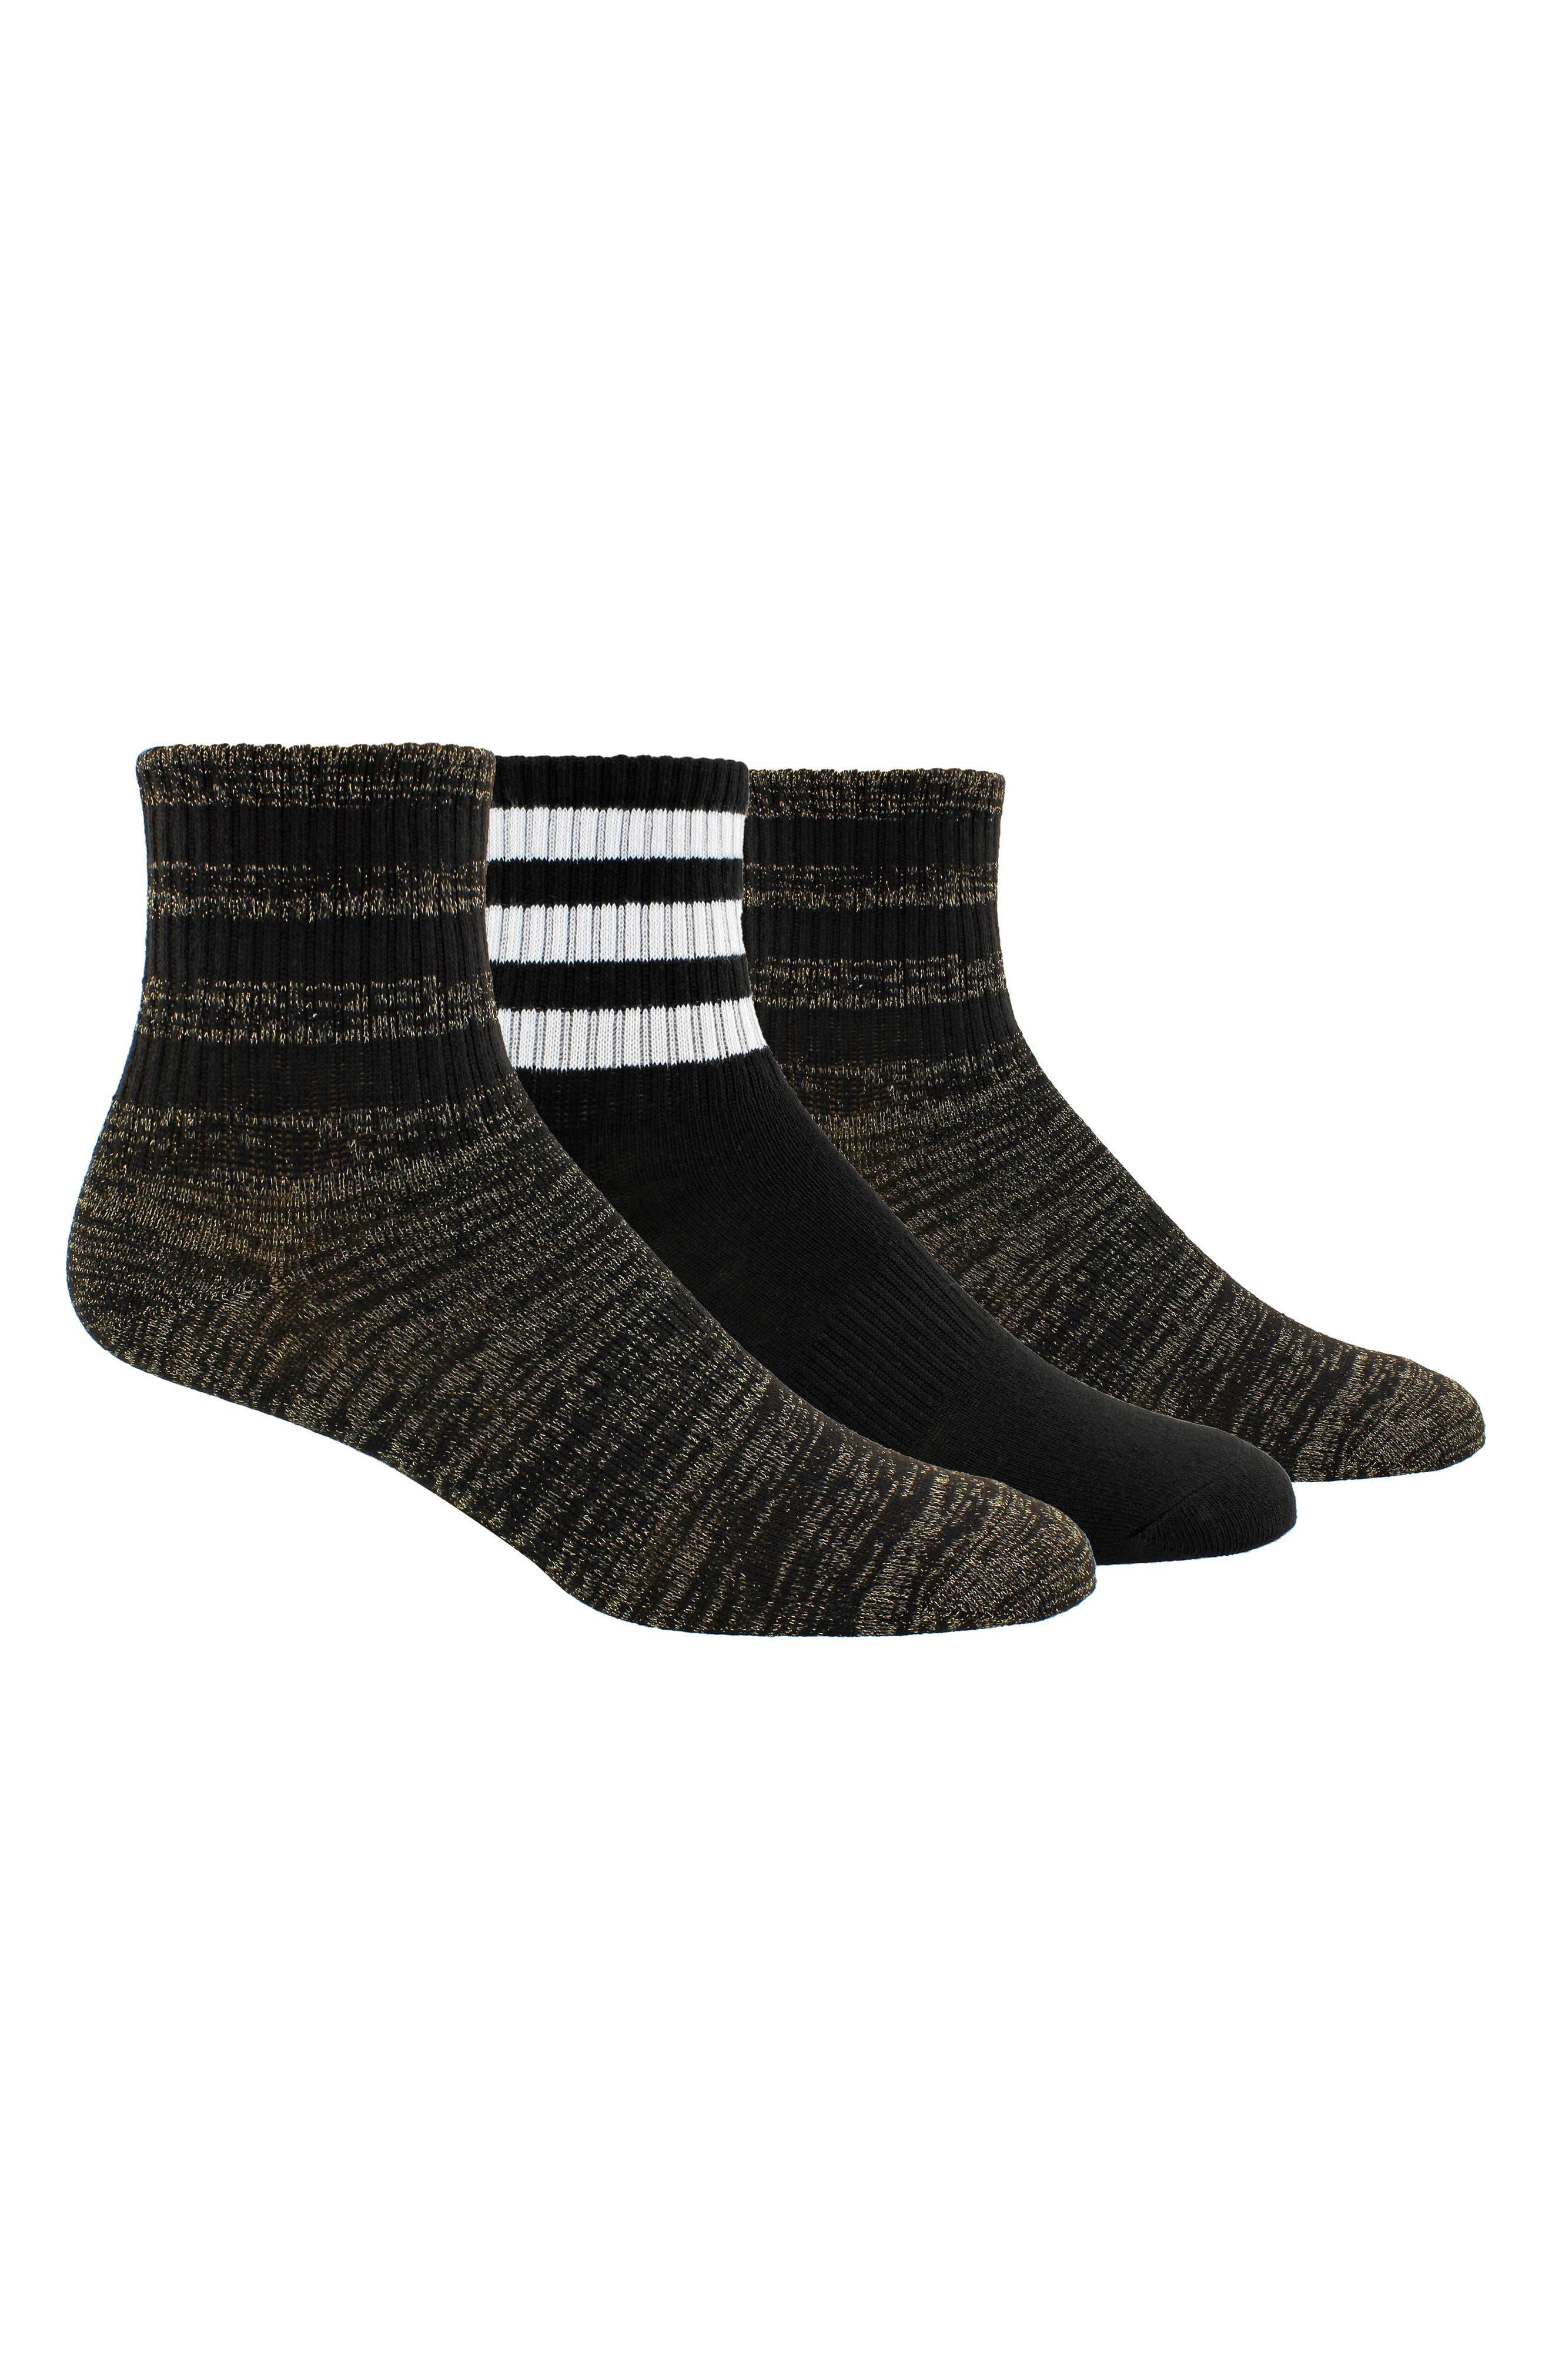 3-Stripes 3-Pack Ankle Socks,                         Main,                         color, 001